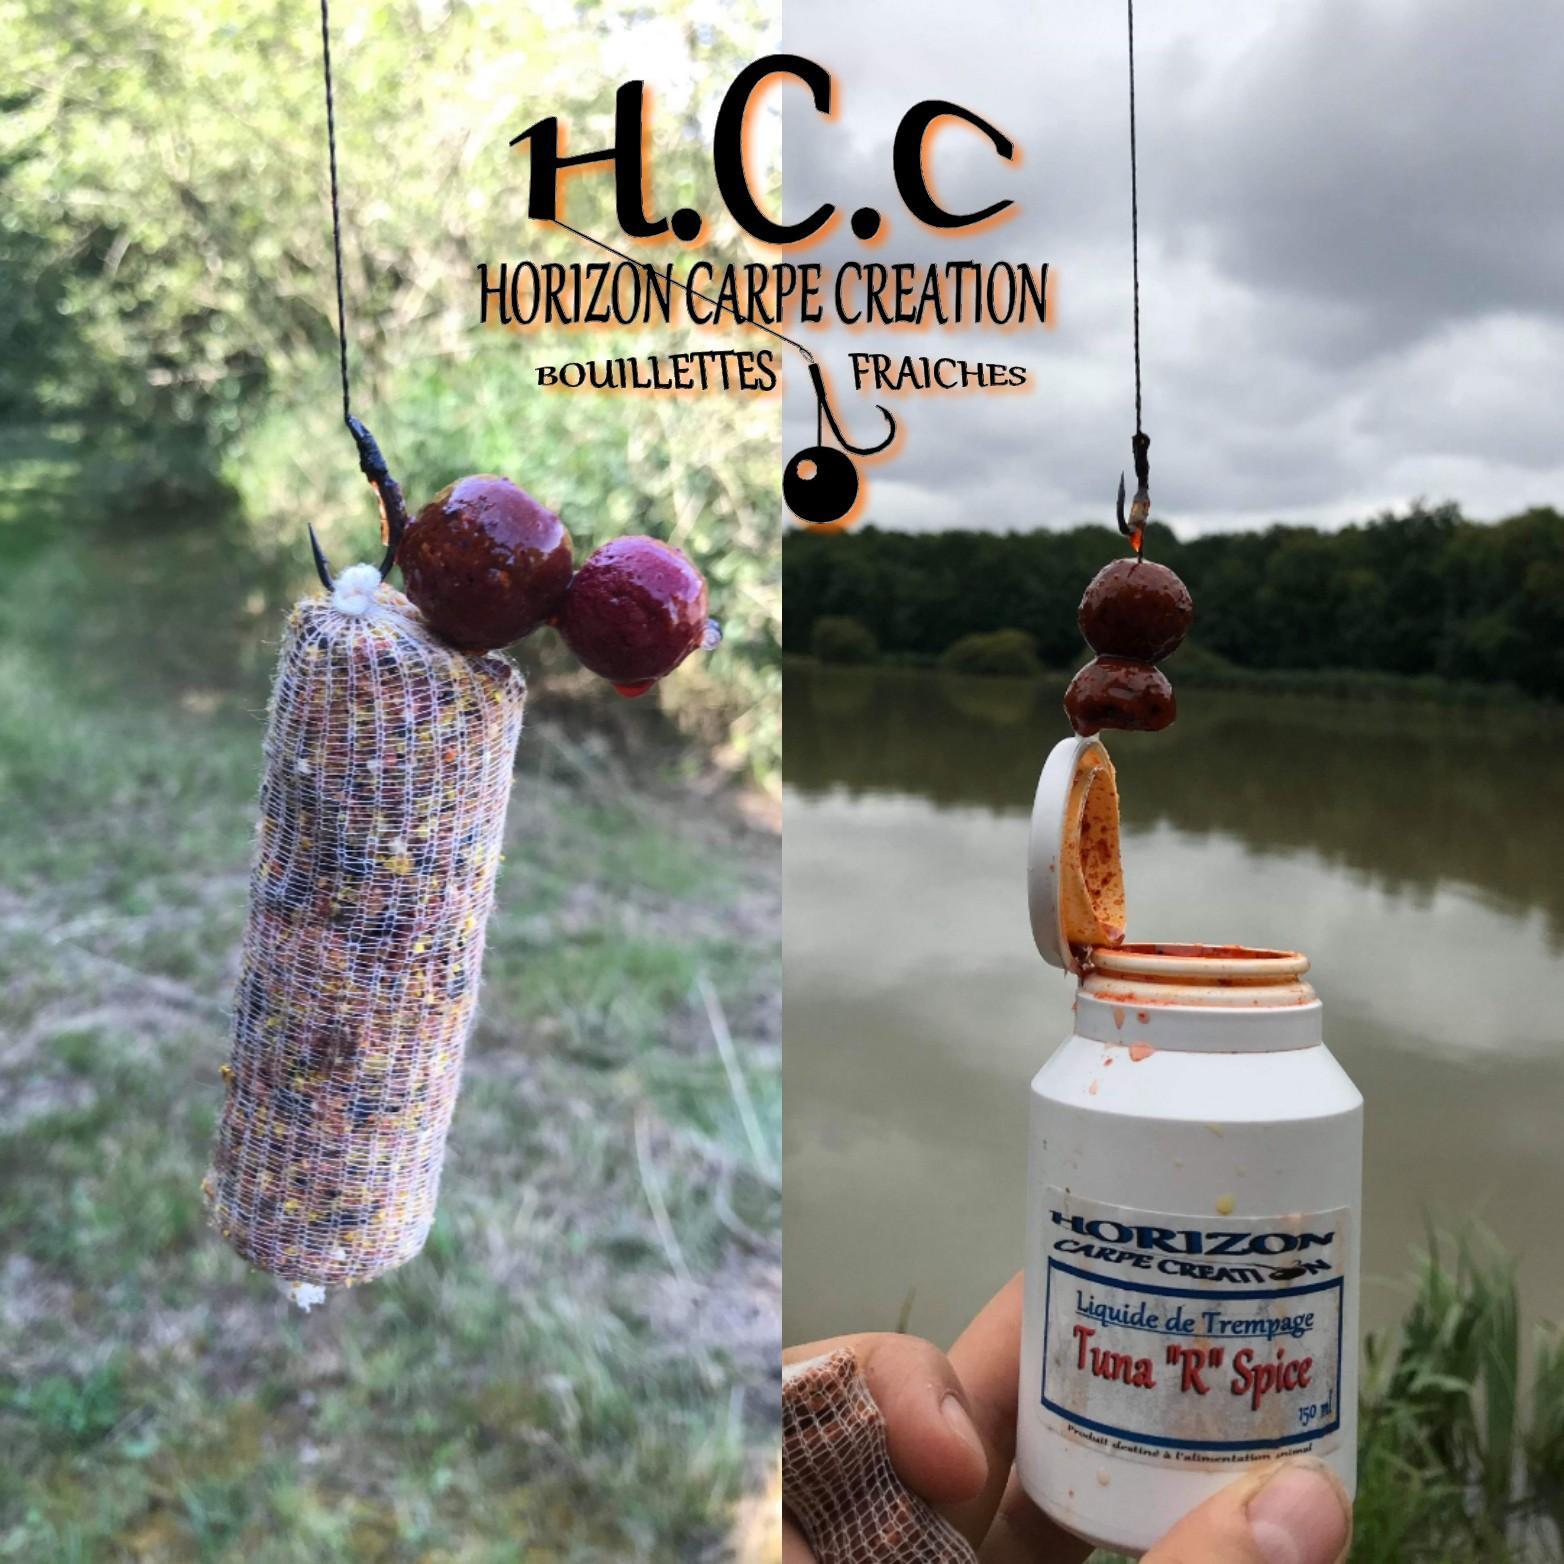 SANDRINE ARMIRAIL - TEAM HCC